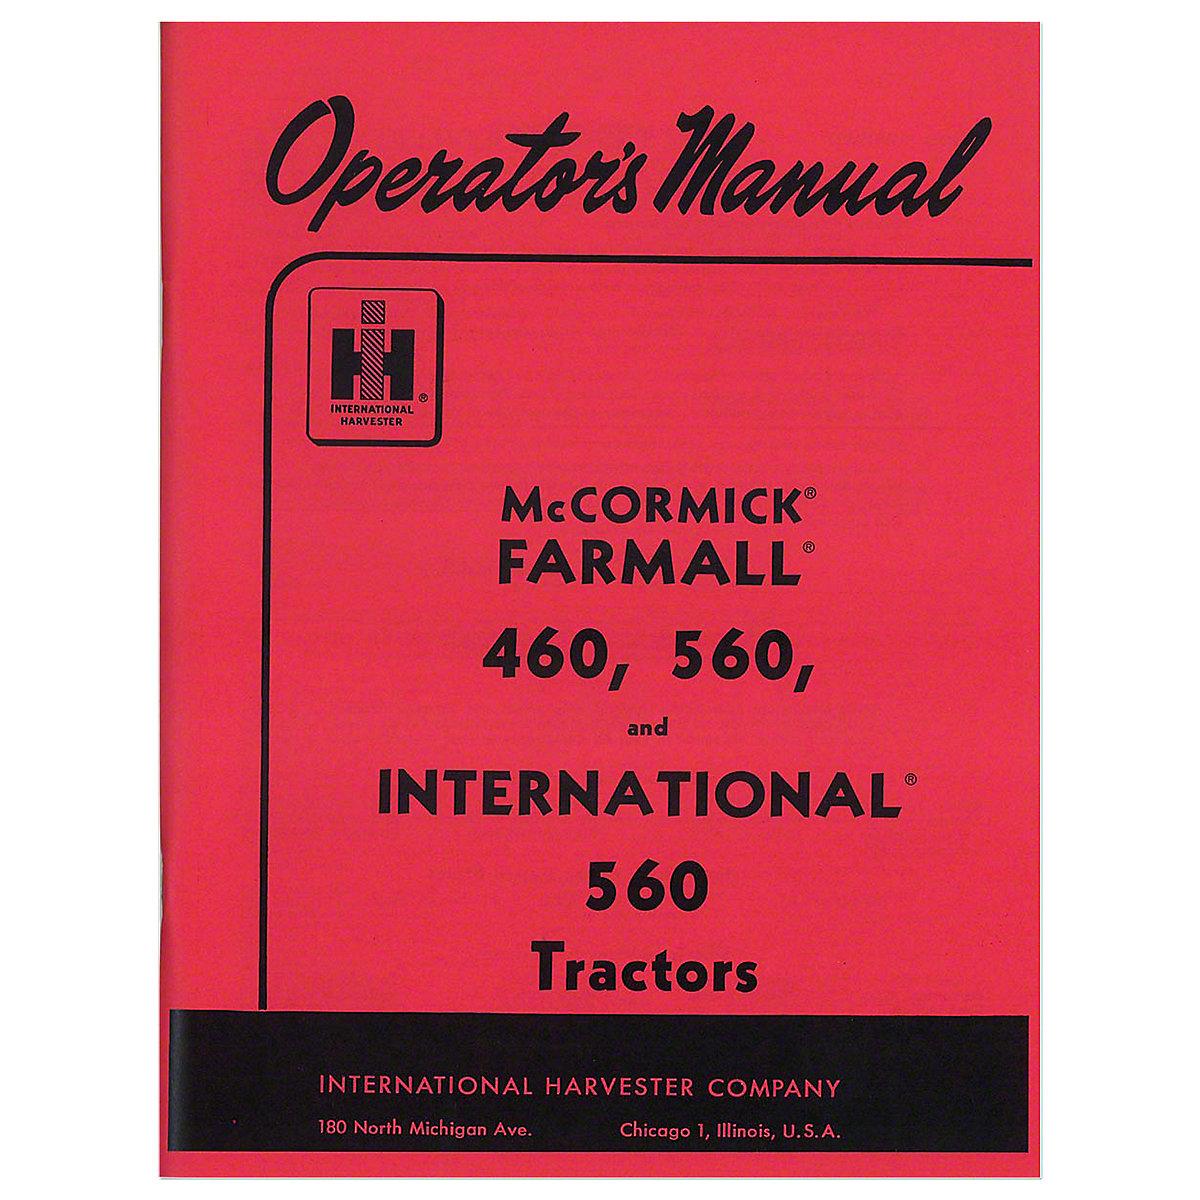 Operators Manual: Farmall 560 Gas